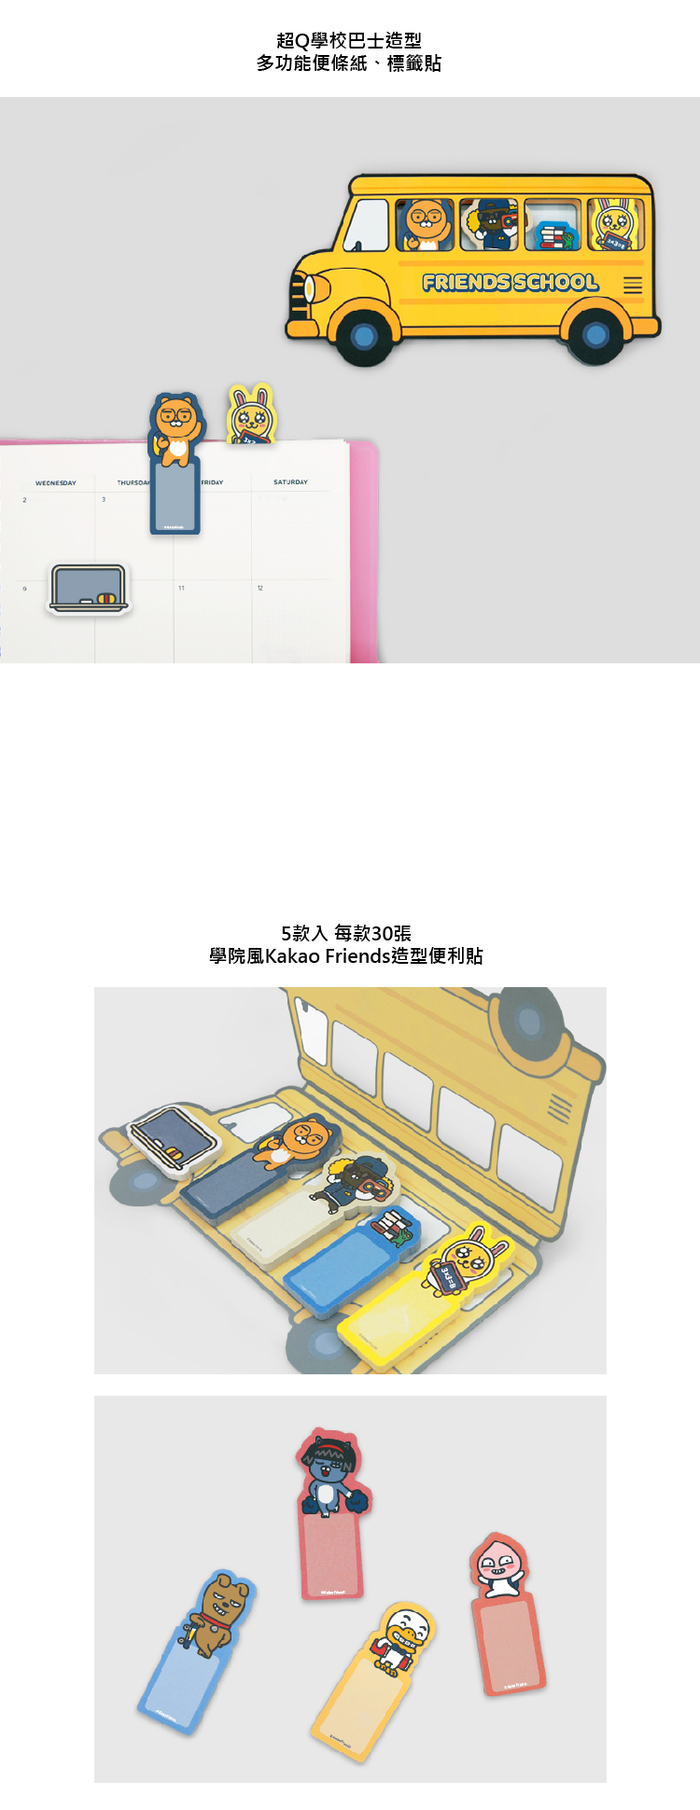 Kakao Friends|好朋友學院系列 鐵櫃筆記便條紙 校車標籤便條貼 二入組